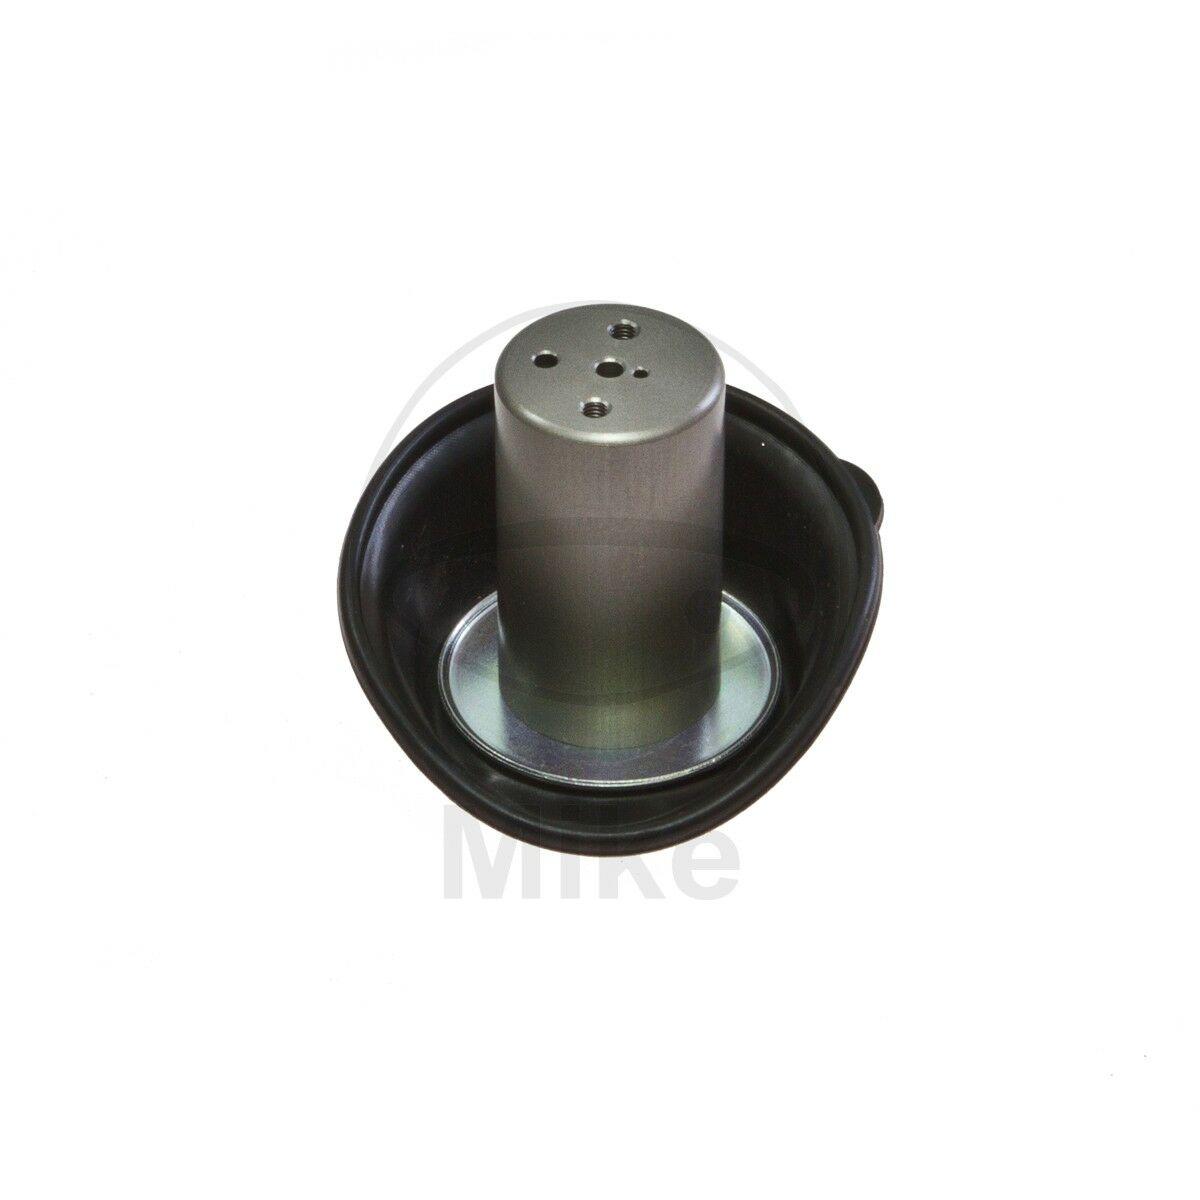 Obrázek produktu Membrána karburátoru se šoupětem JMT